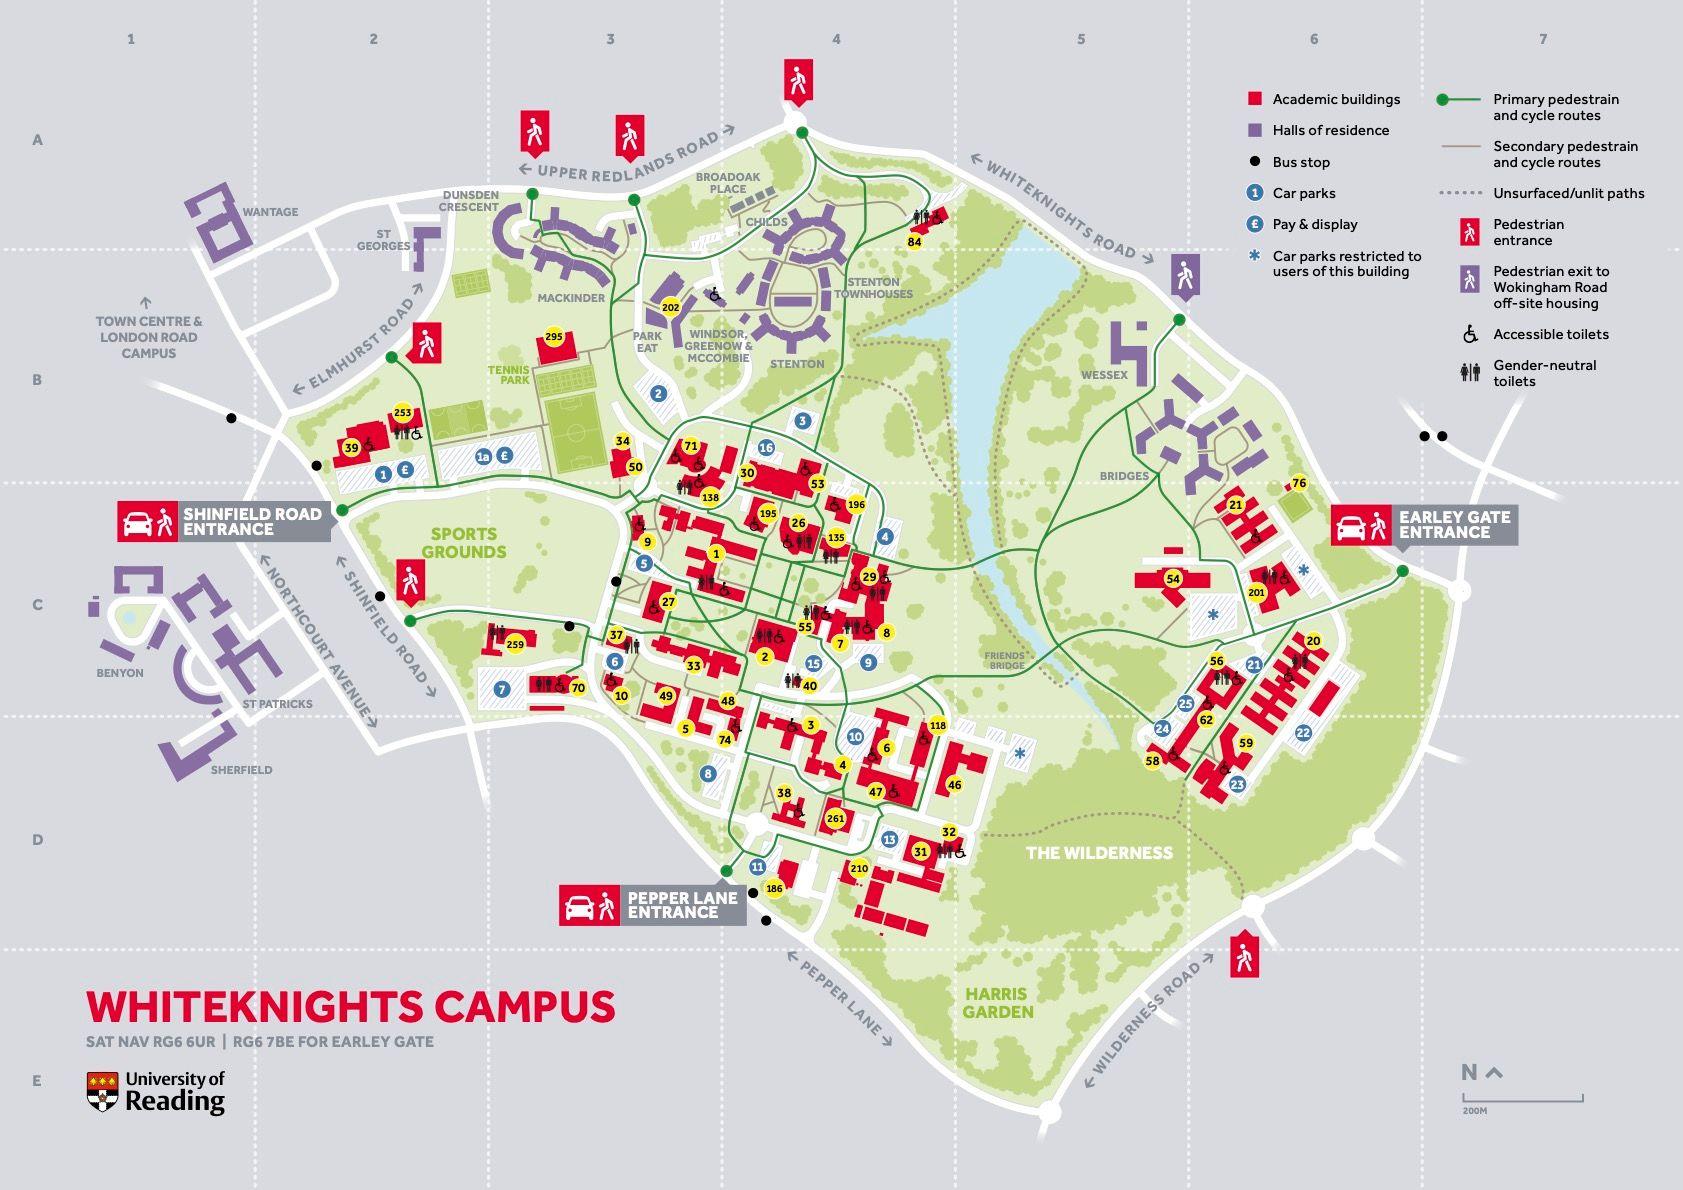 university of reading whiteknights